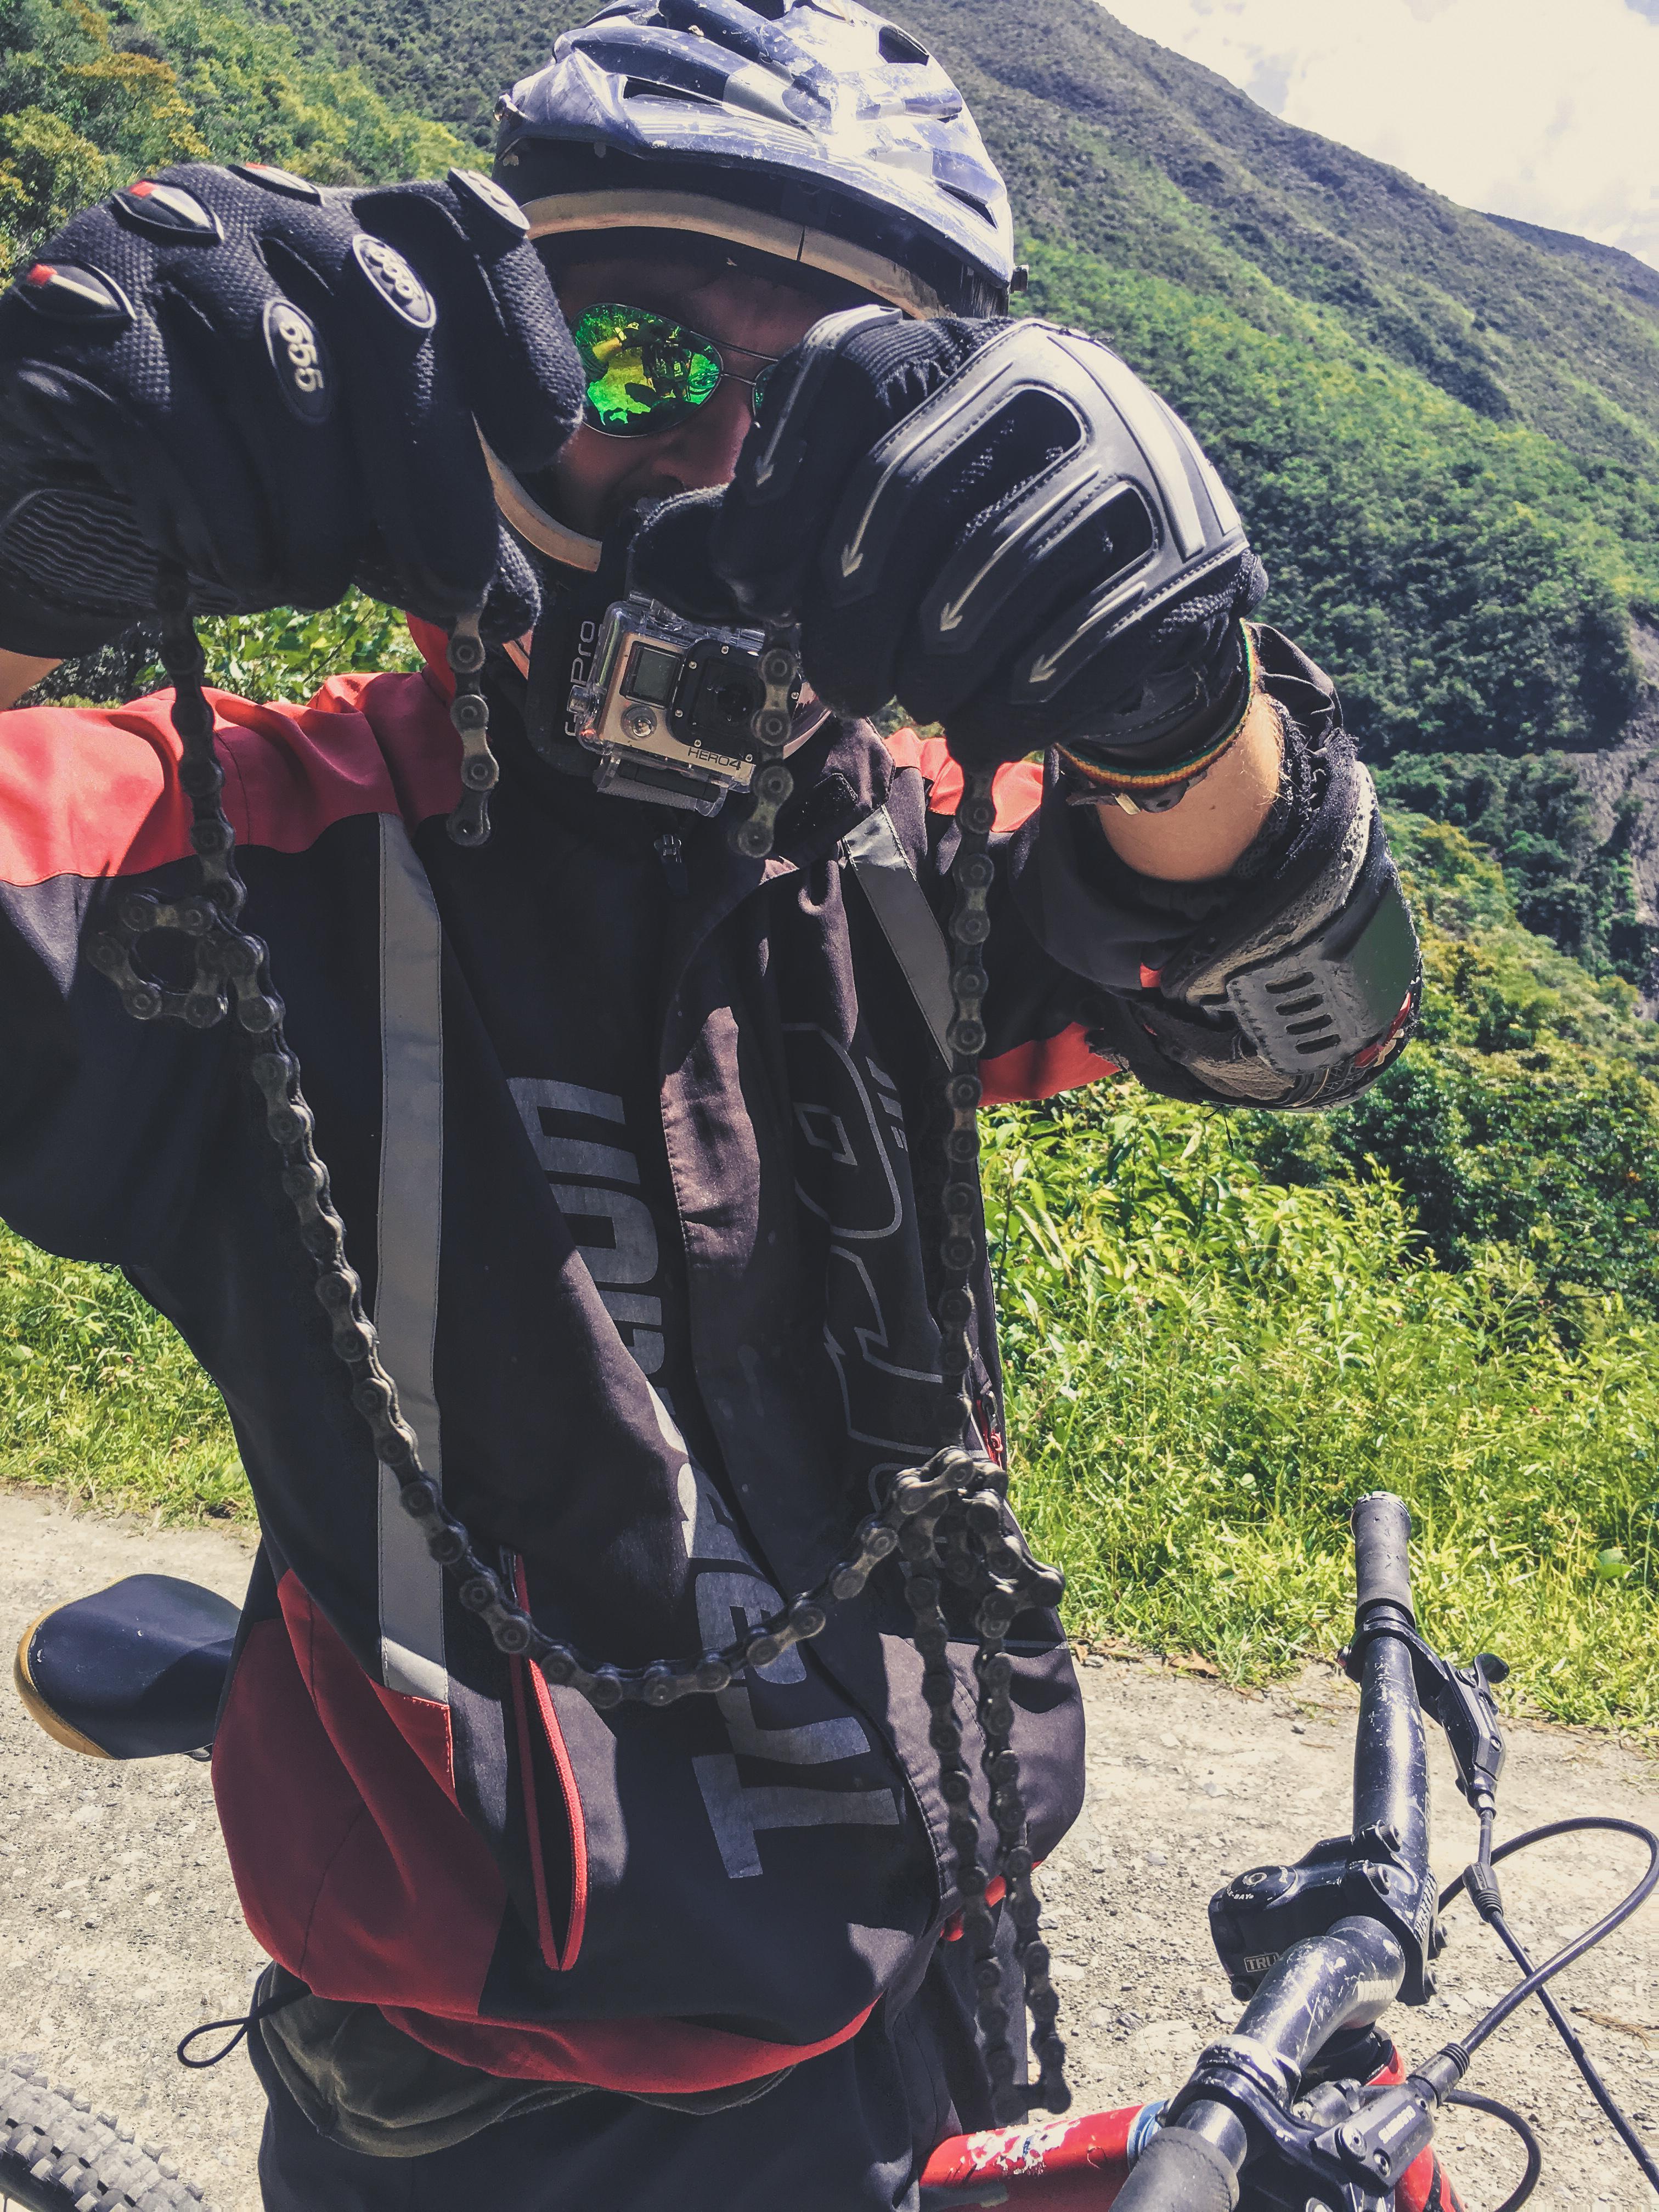 biking worlds most dangerous road bolivia broken bike chain